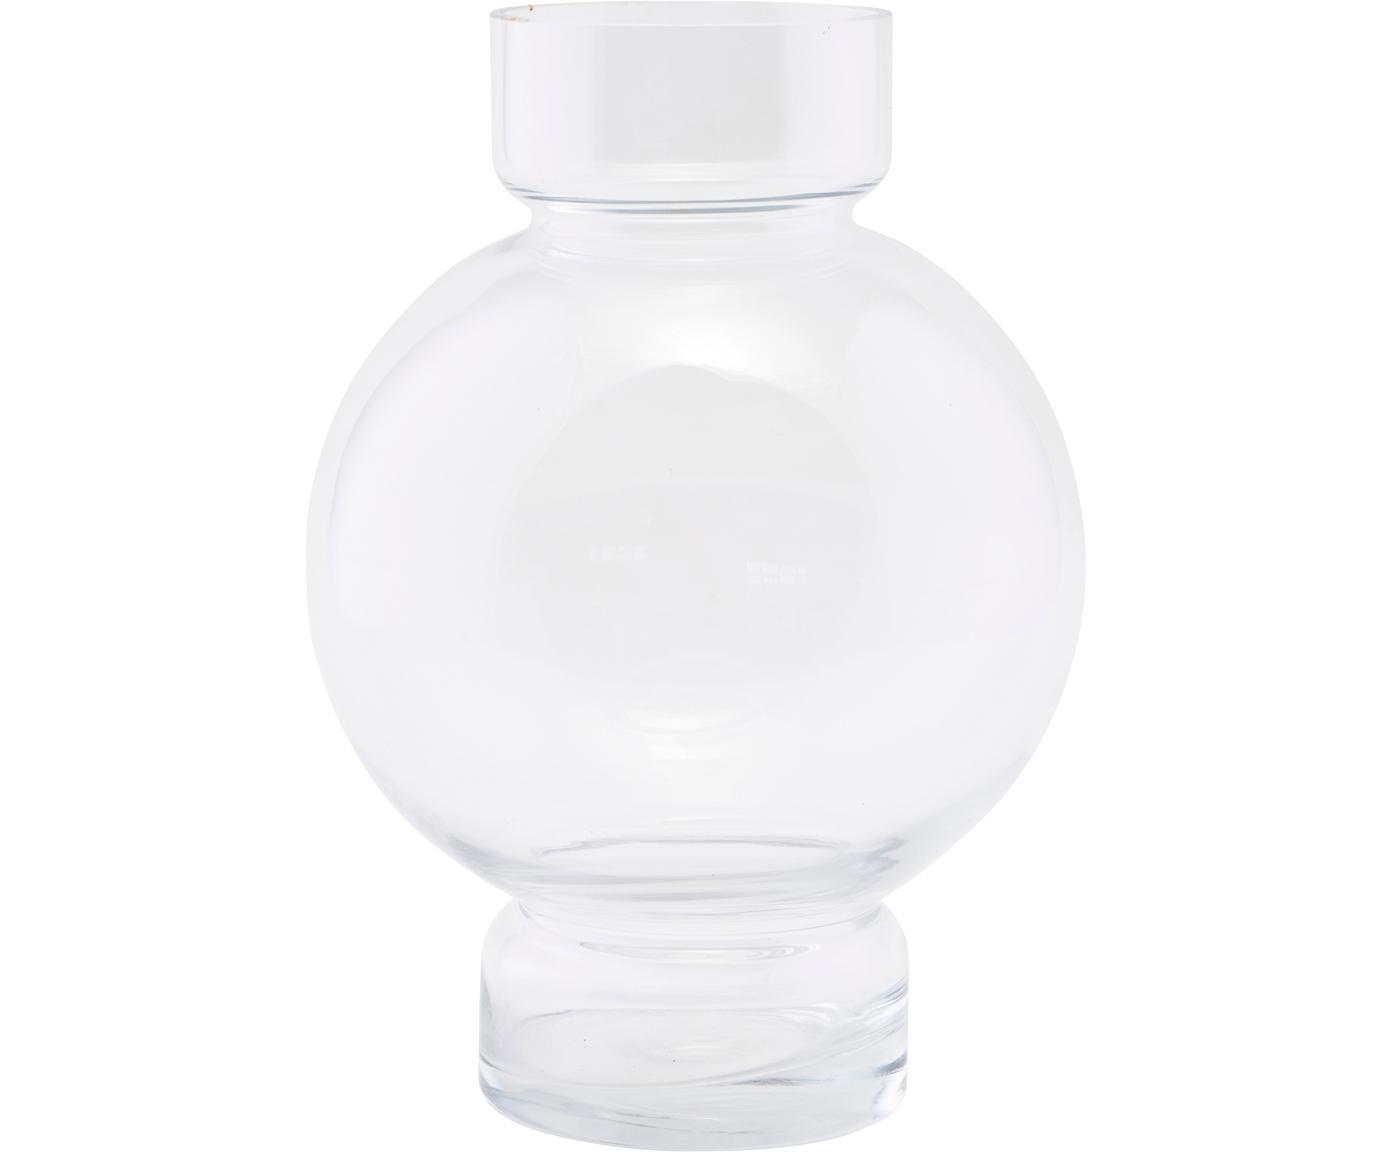 Vaso Bubble, Vetro, Trasparente, Ø 18 x Alt. 25 cm